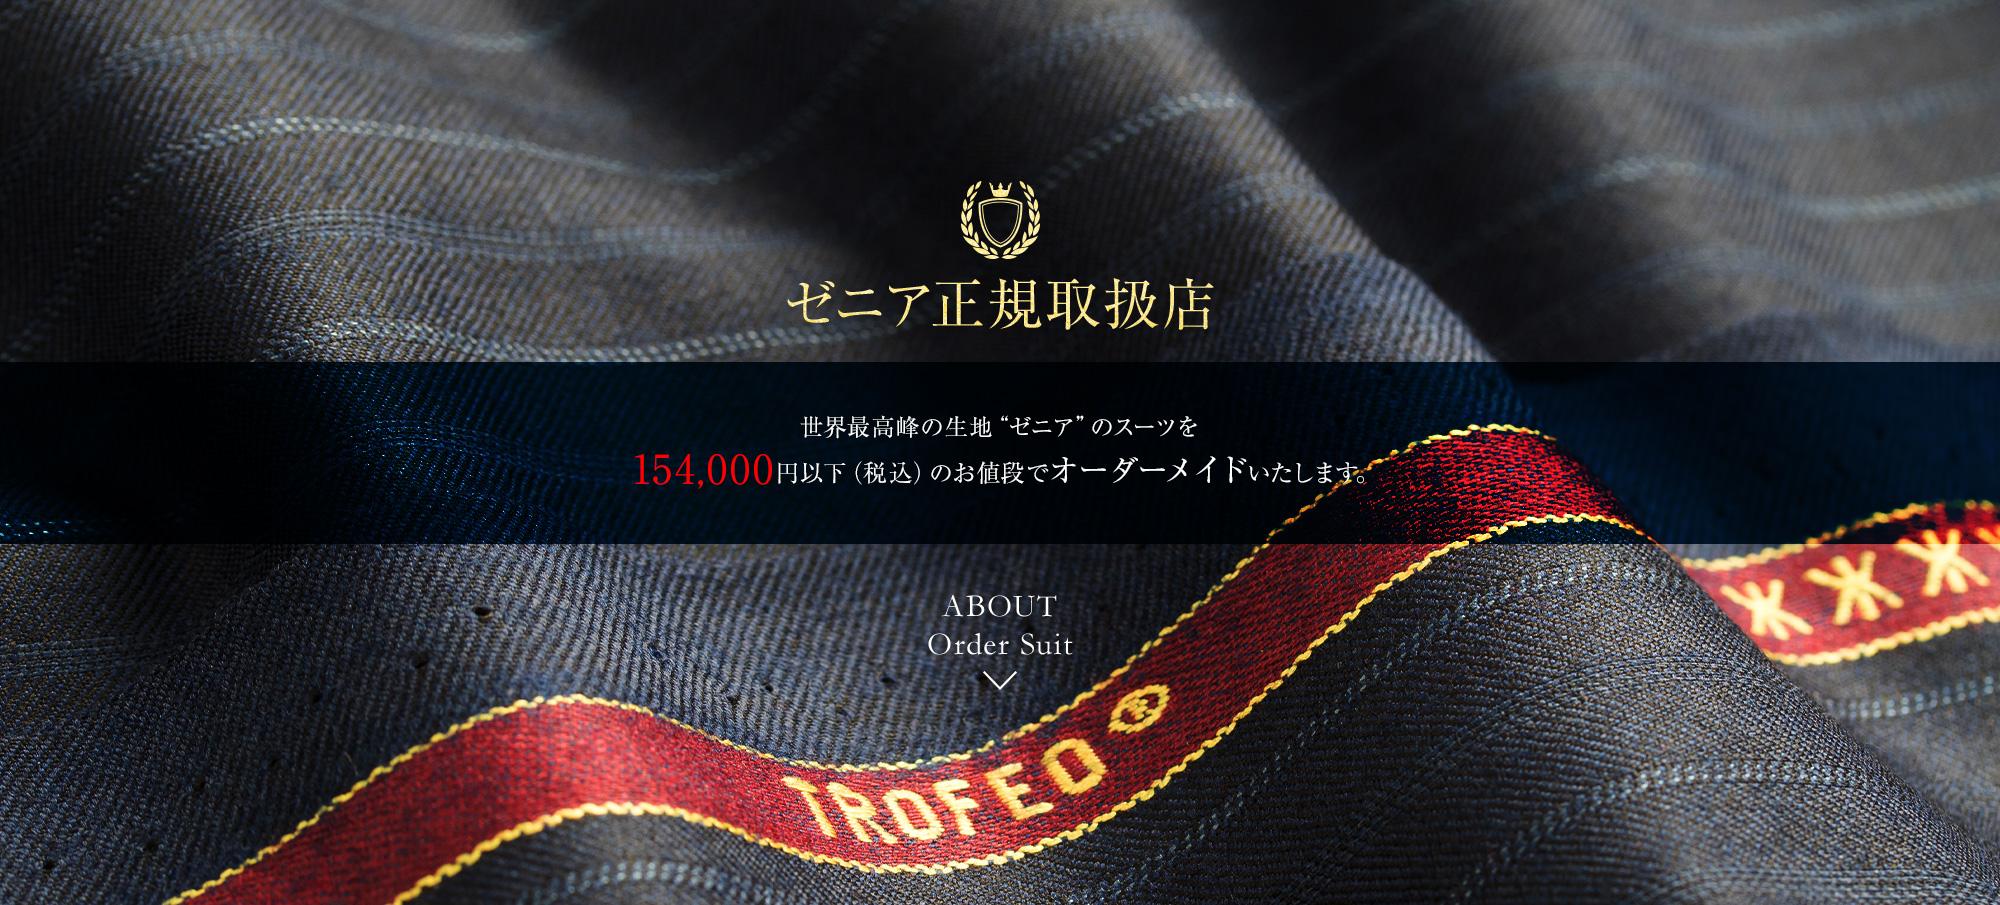 order_suite_banner_on